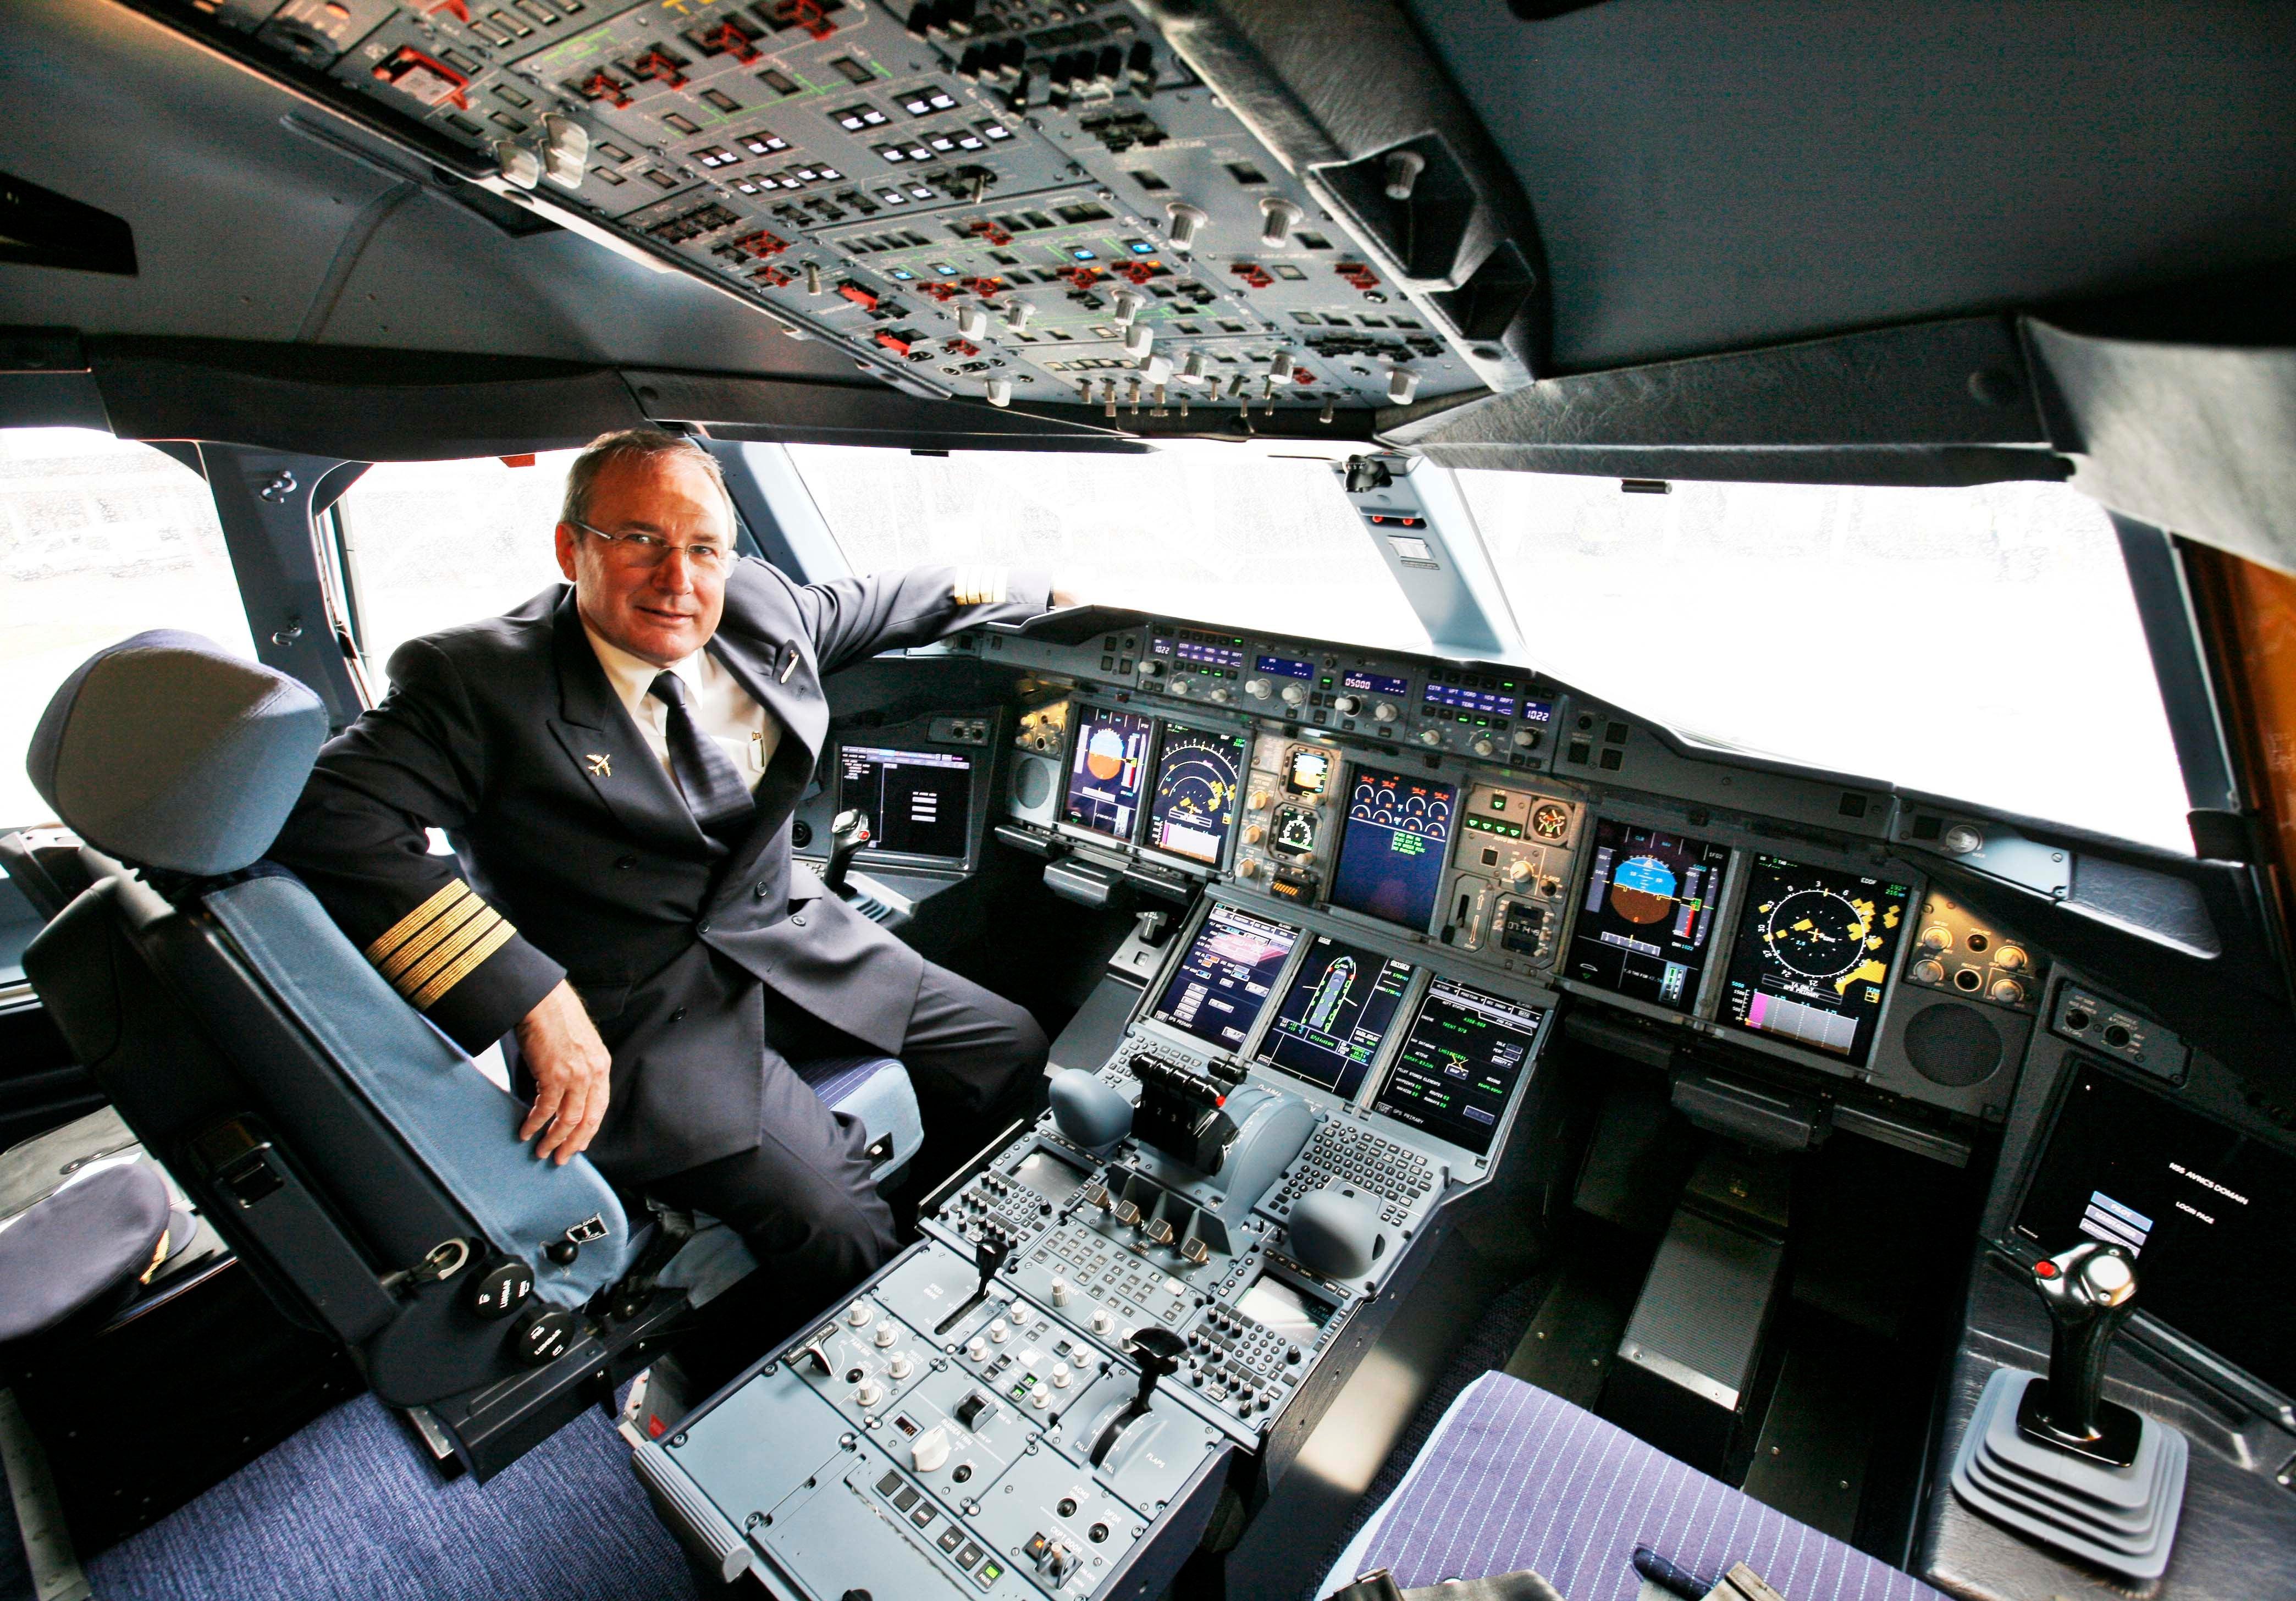 How IKEA Could Change Jet Cockpit Design